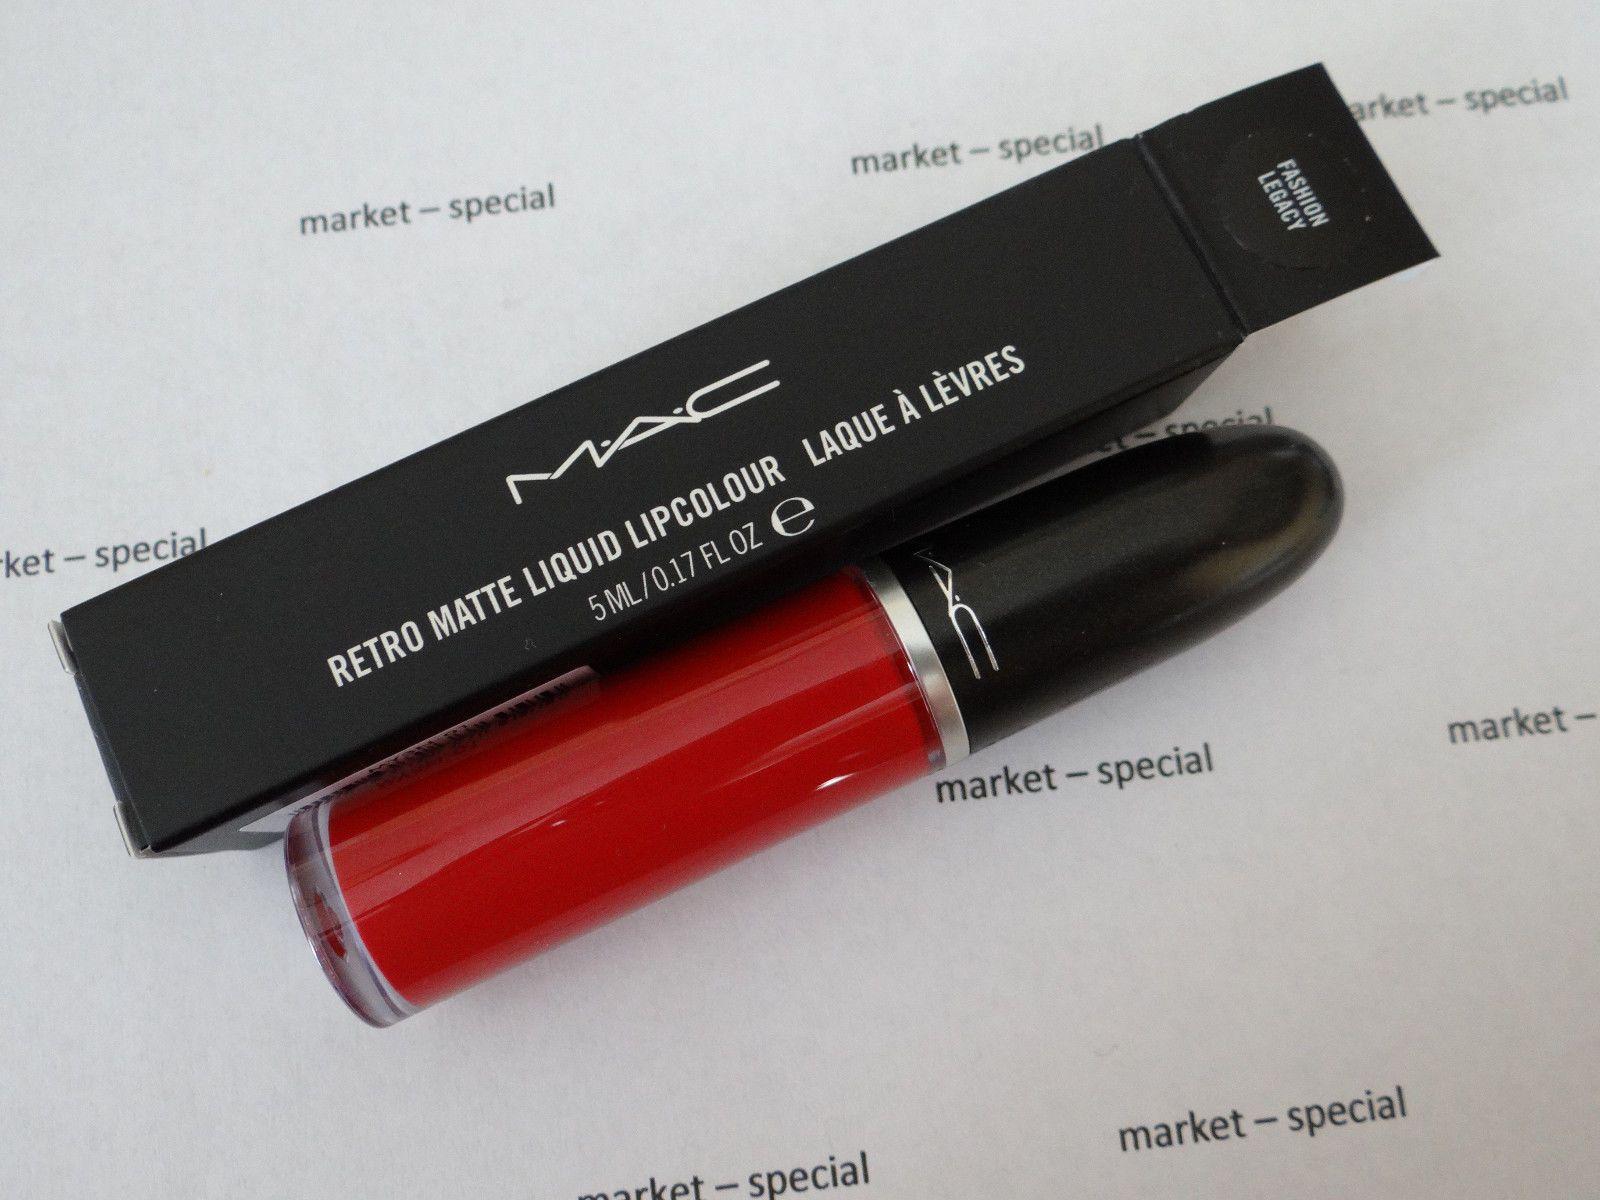 Mac Retro Matte Liquid Lipcolor Fashion Legacy Liquid Lipstick Nib Last1 Mac Liquid Lipstick Mac Lipstick Shades Mac Retro Matte